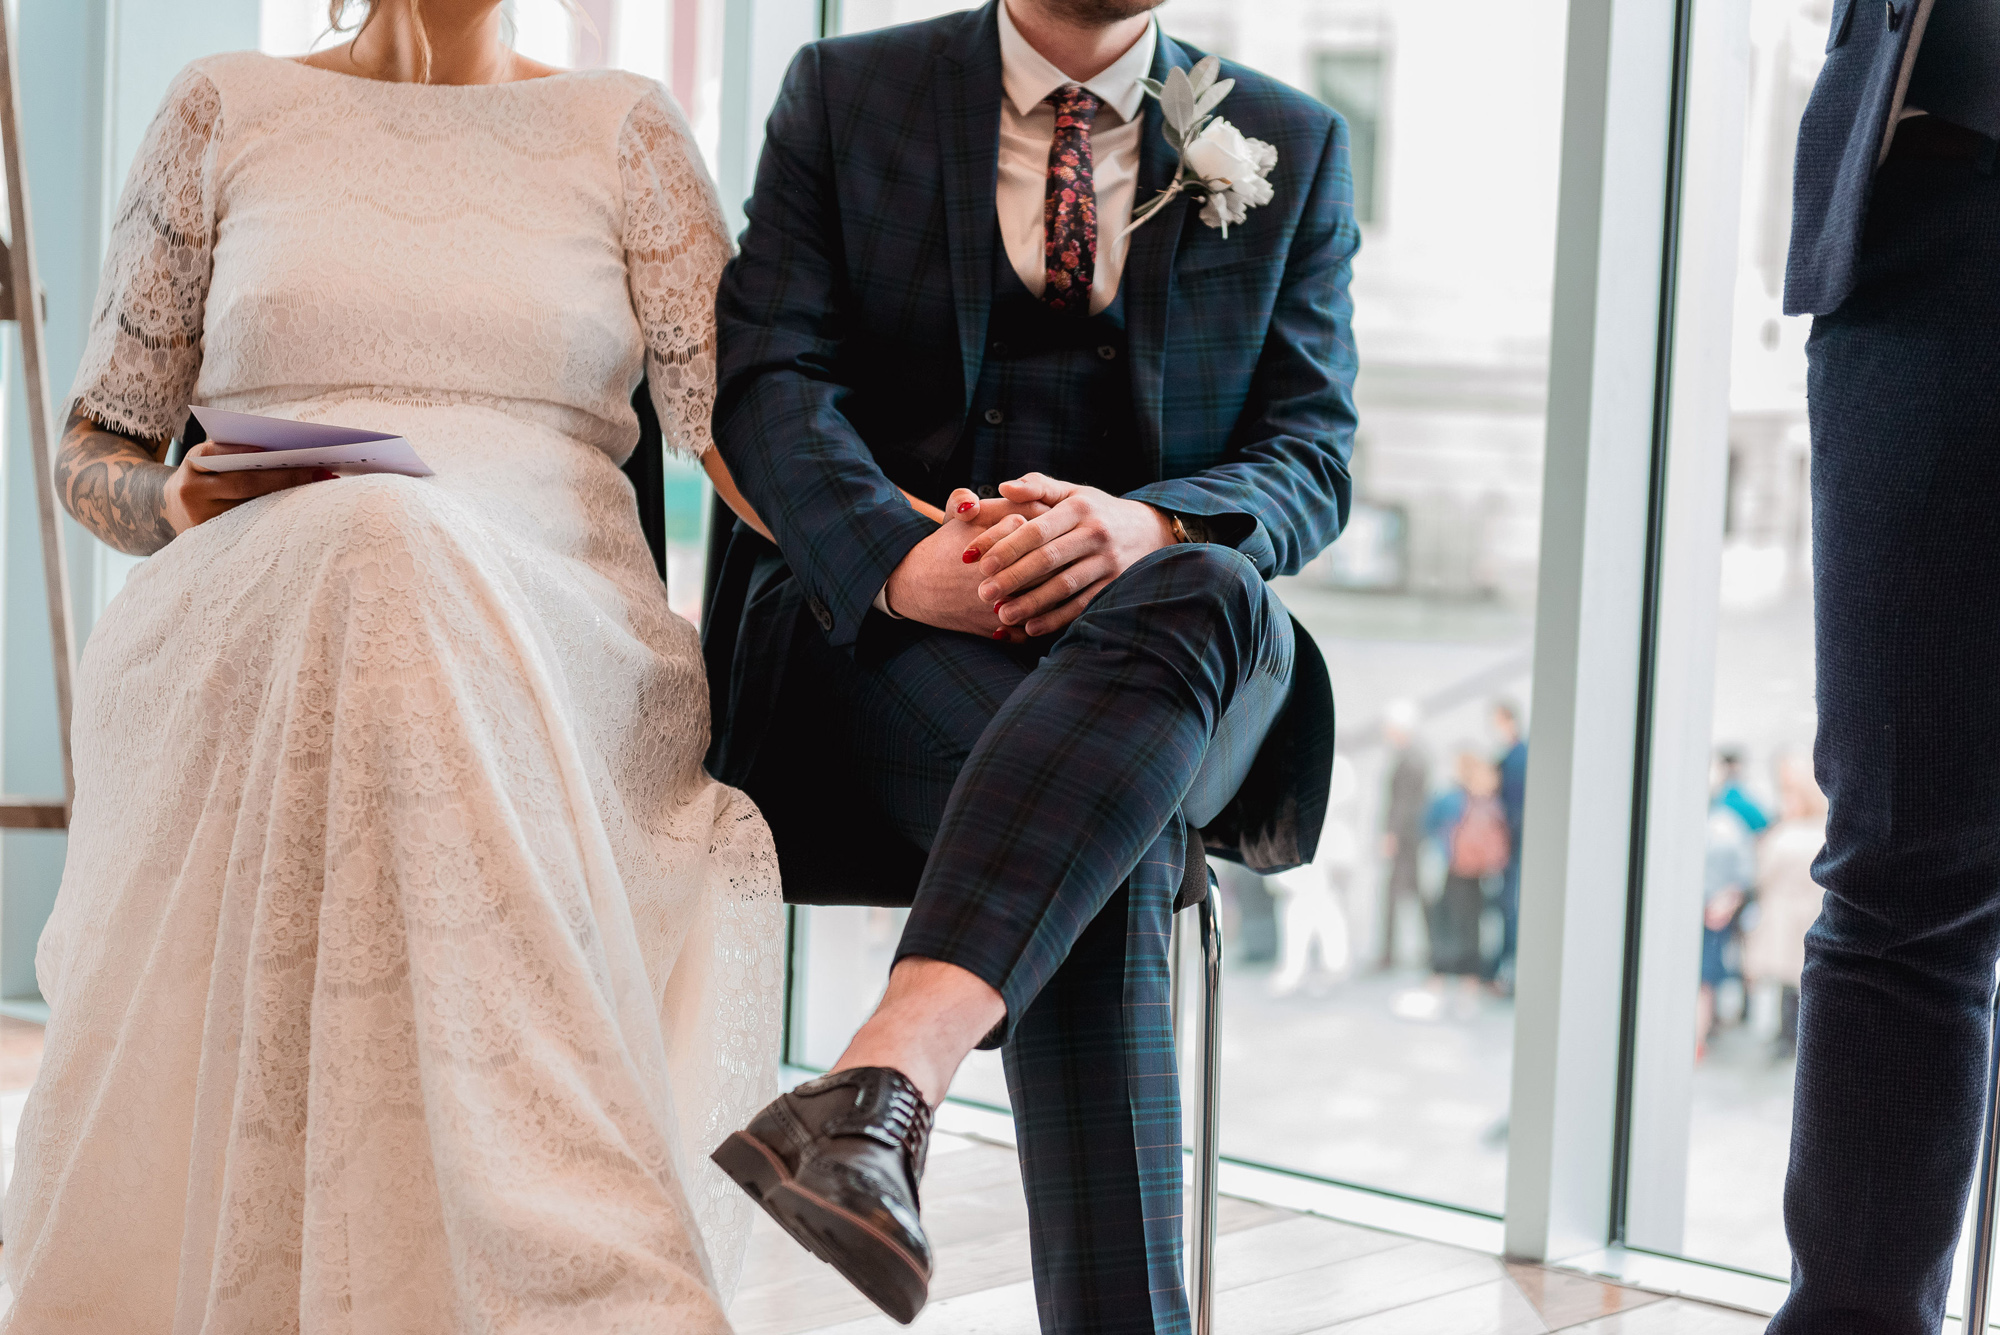 Harriet-Dahlia-Bespoke-Lace-Silk-Bohemian-Wedding-Dress-Sleeves-Tattooed-Bride-Alternative-Wedding-Sheffield-7.jpg